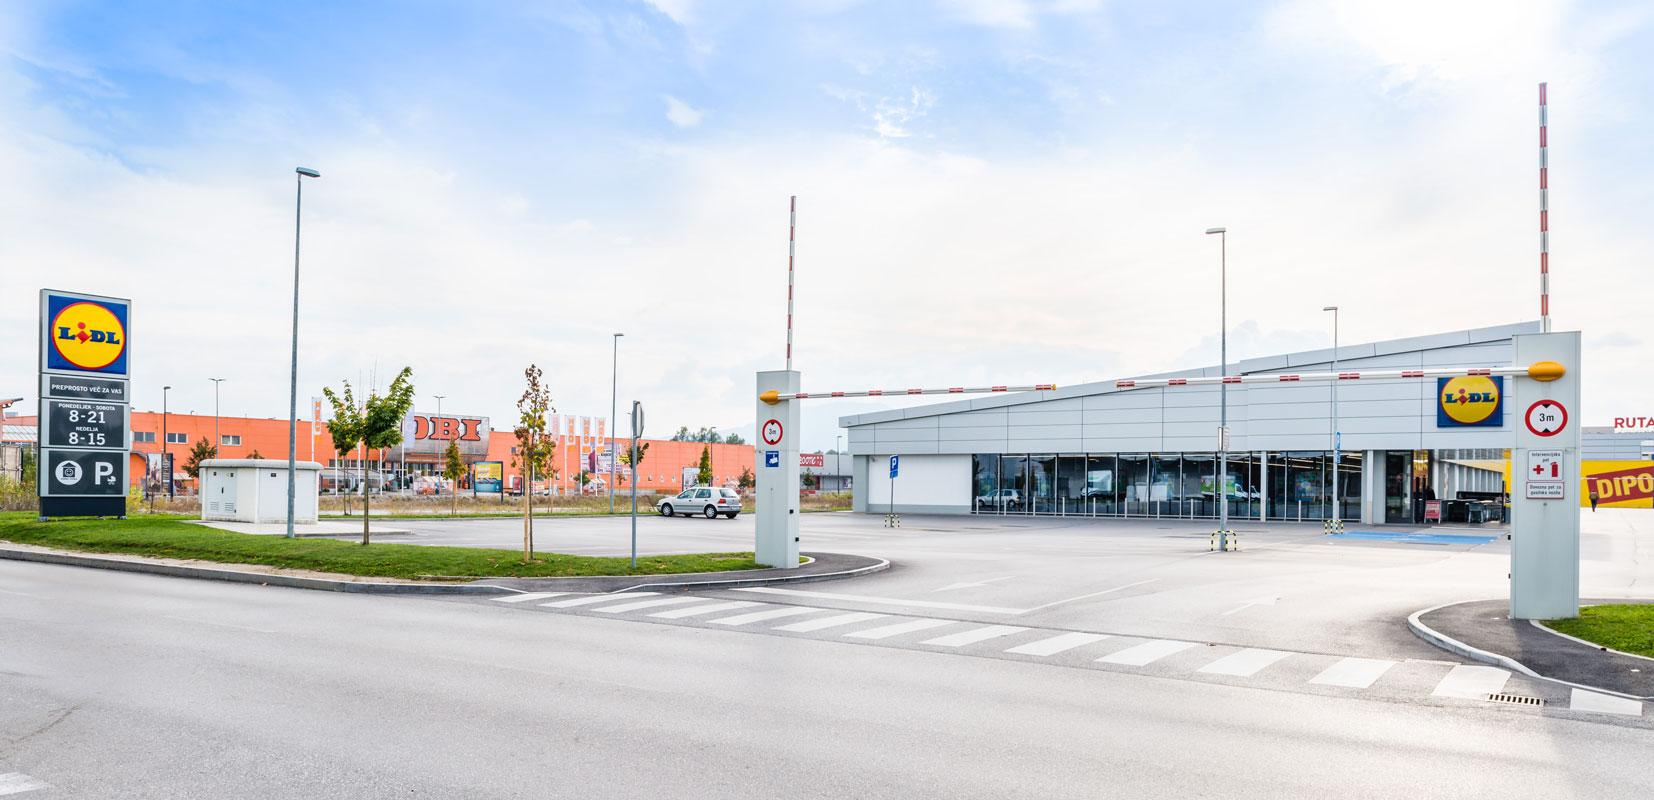 Trgovski objekt LIDL Rudnik, Ljubljana